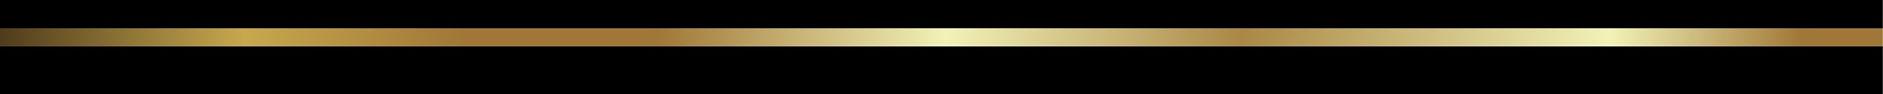 Gold Line.jpg